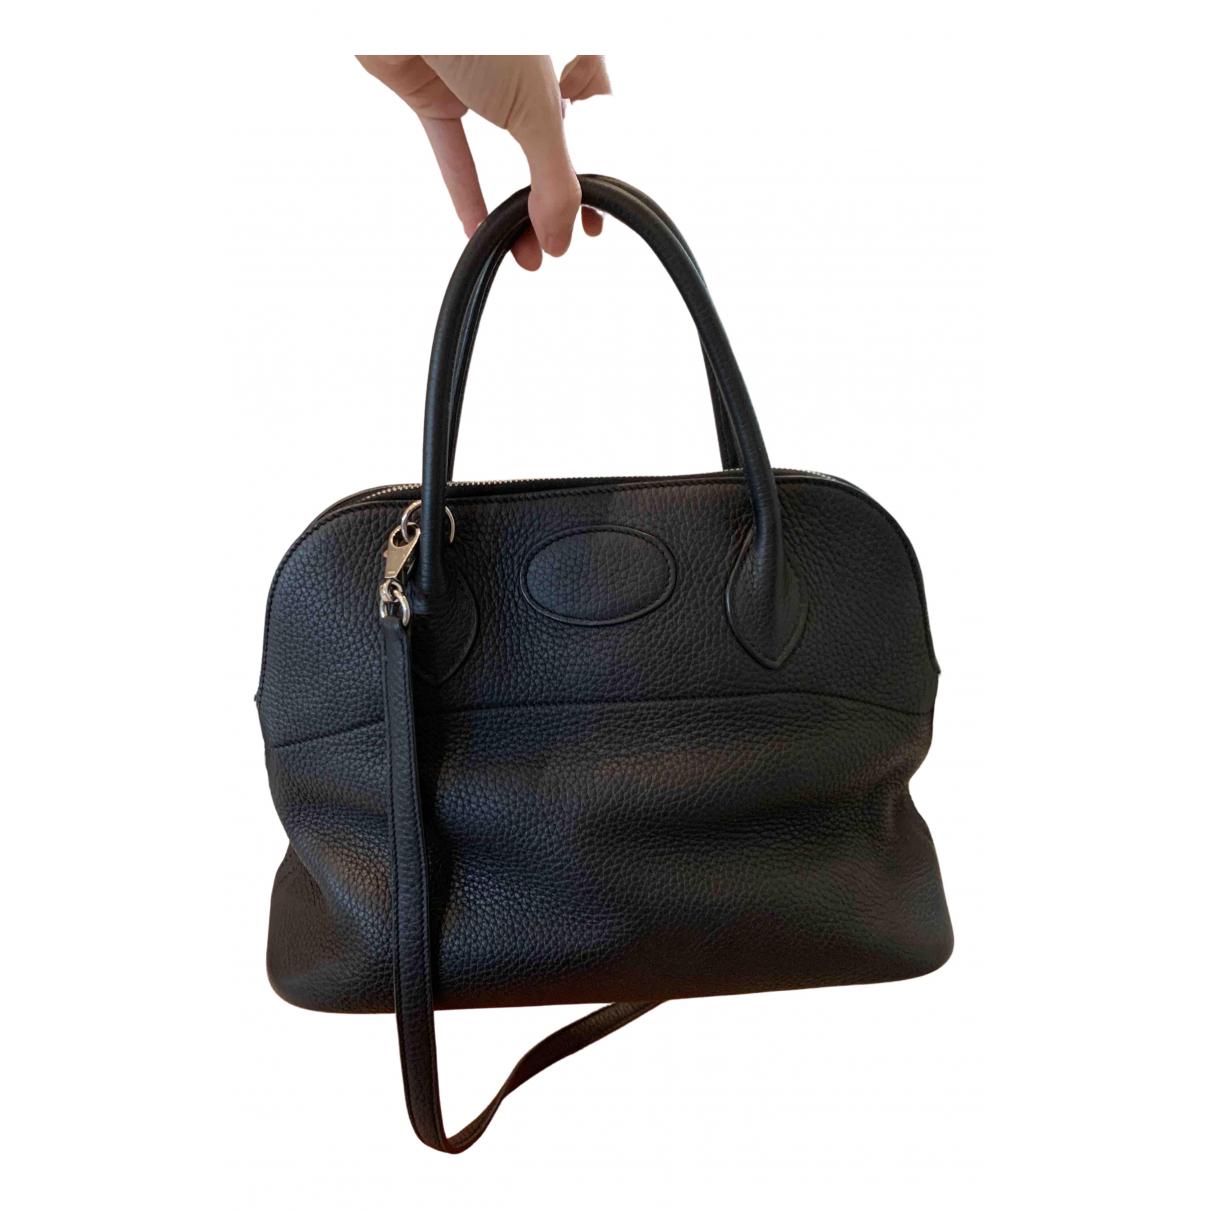 Hermes Bolide Handtasche in  Schwarz Leder